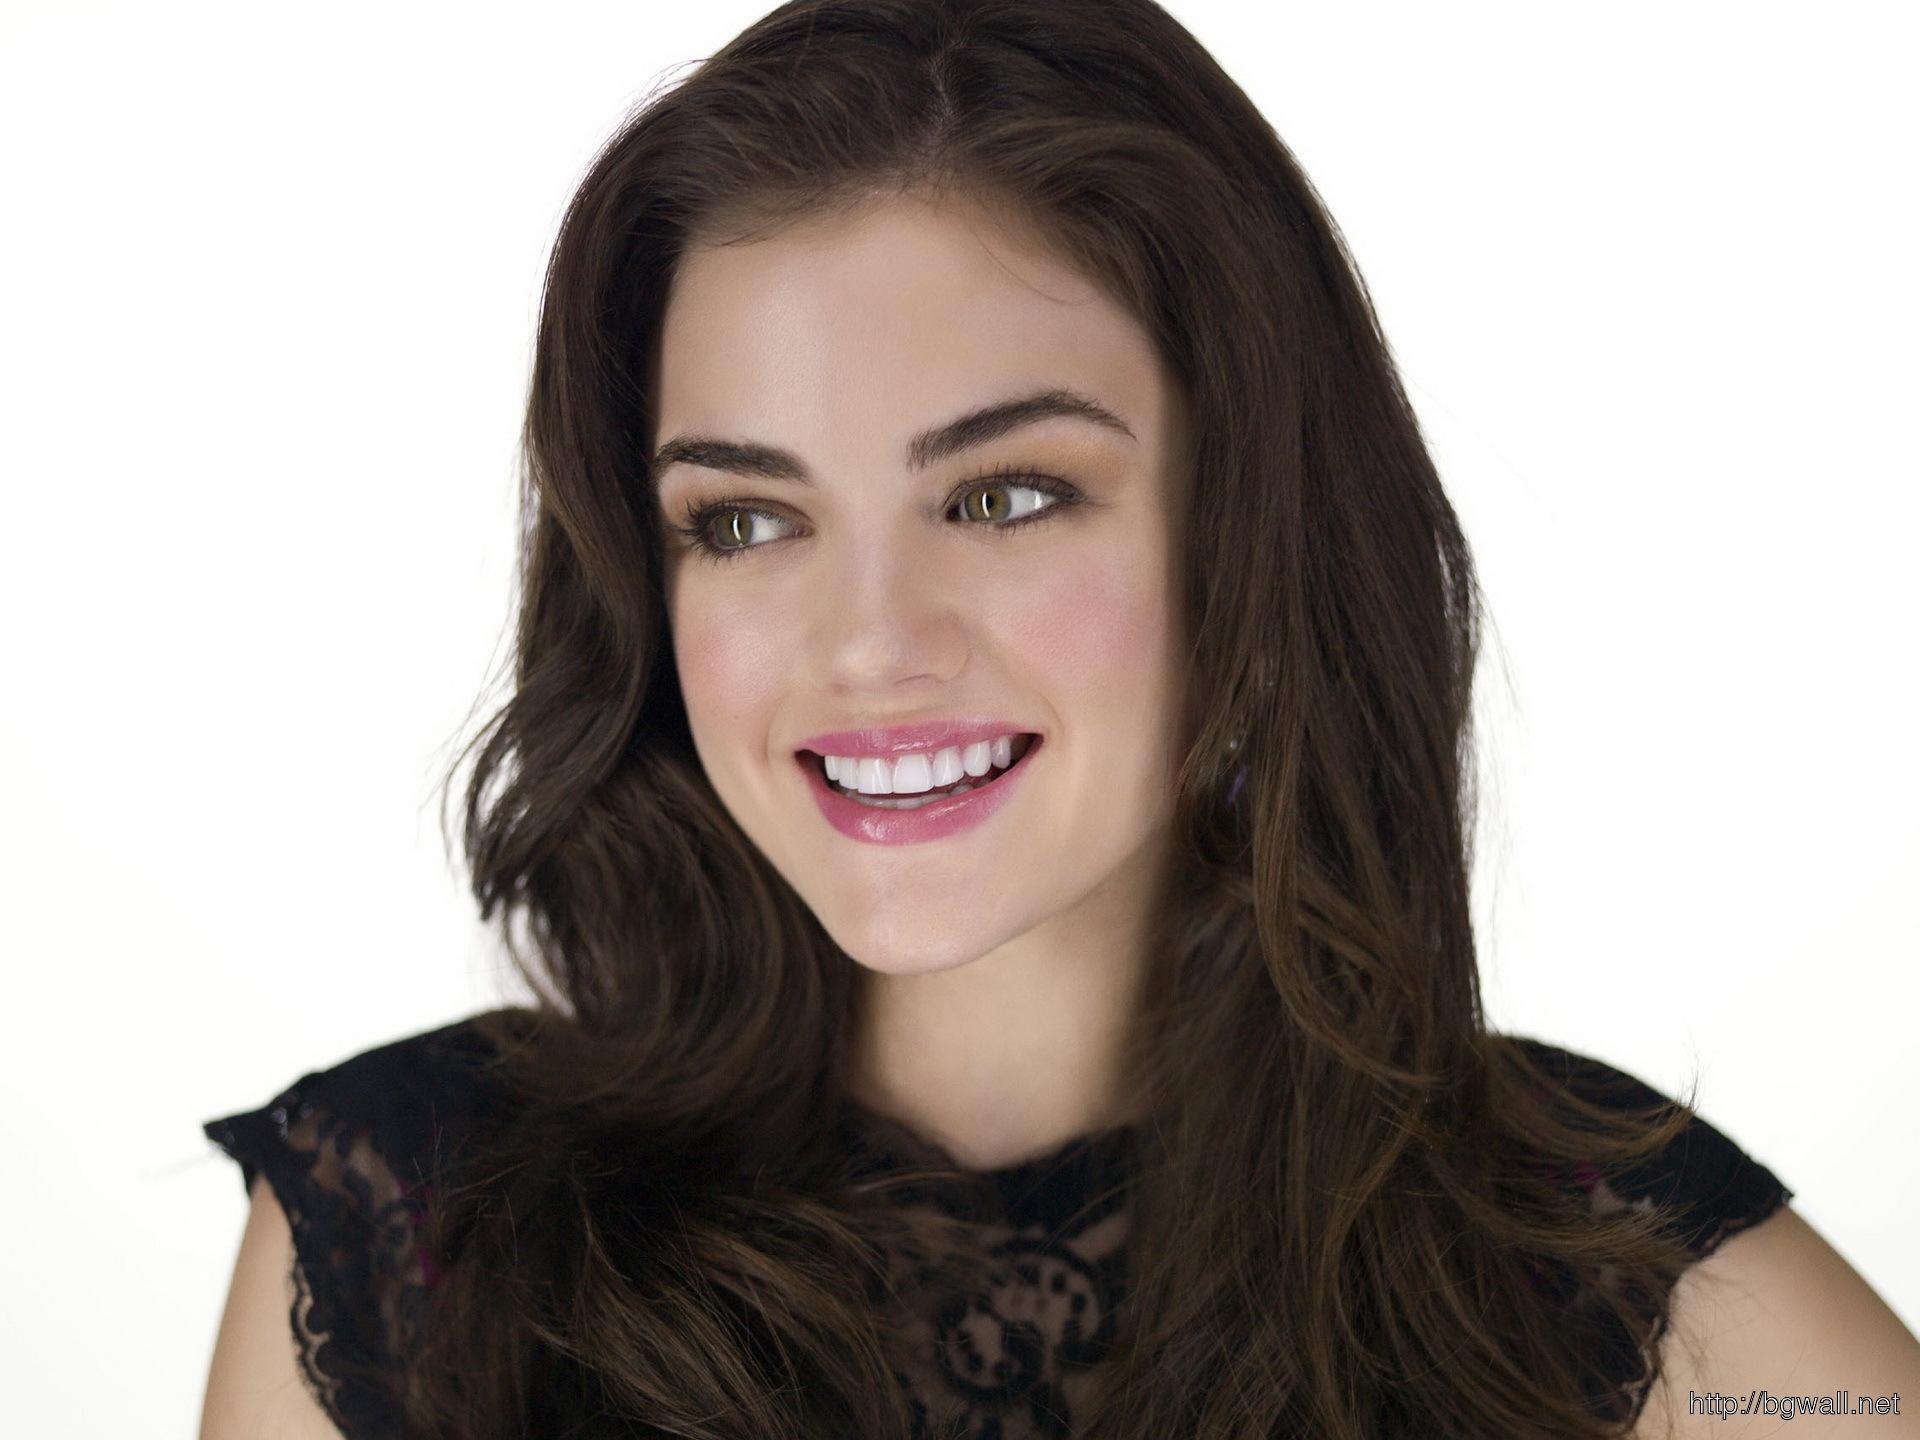 Alizee Wallpaper Hd Lucy Hale Precious Smile Background Wallpaper Hd